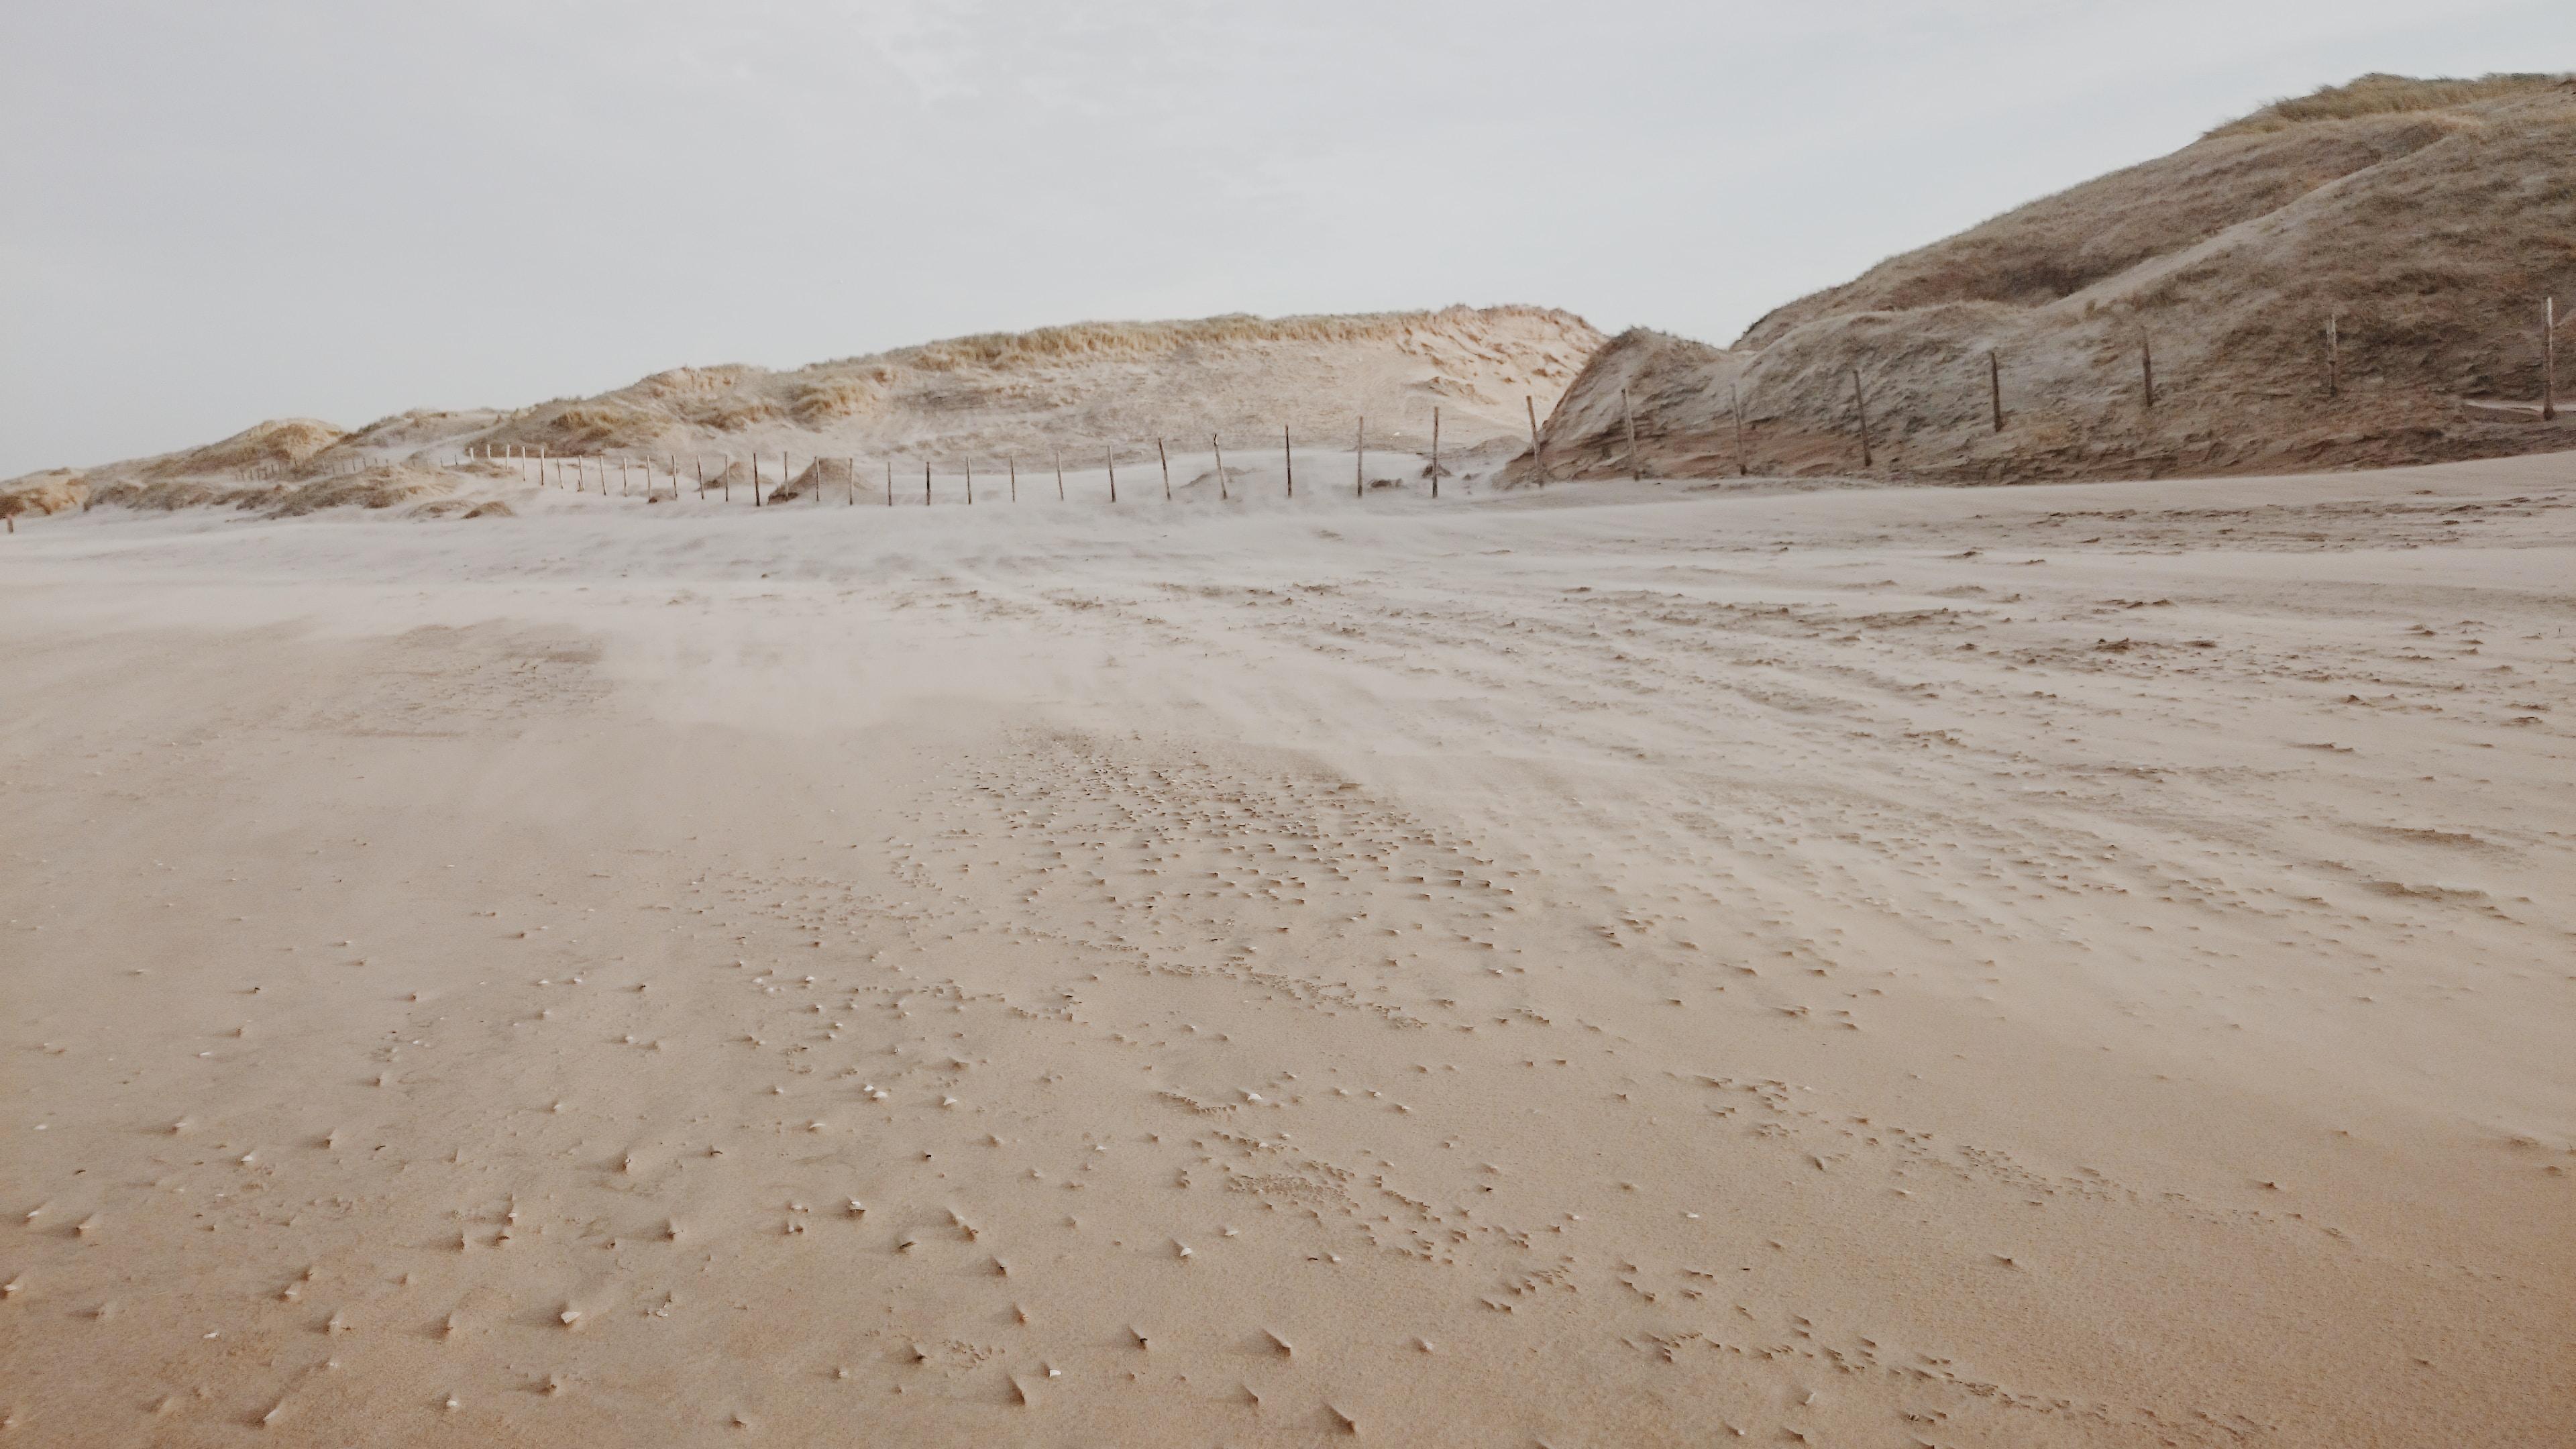 photo of desert dune